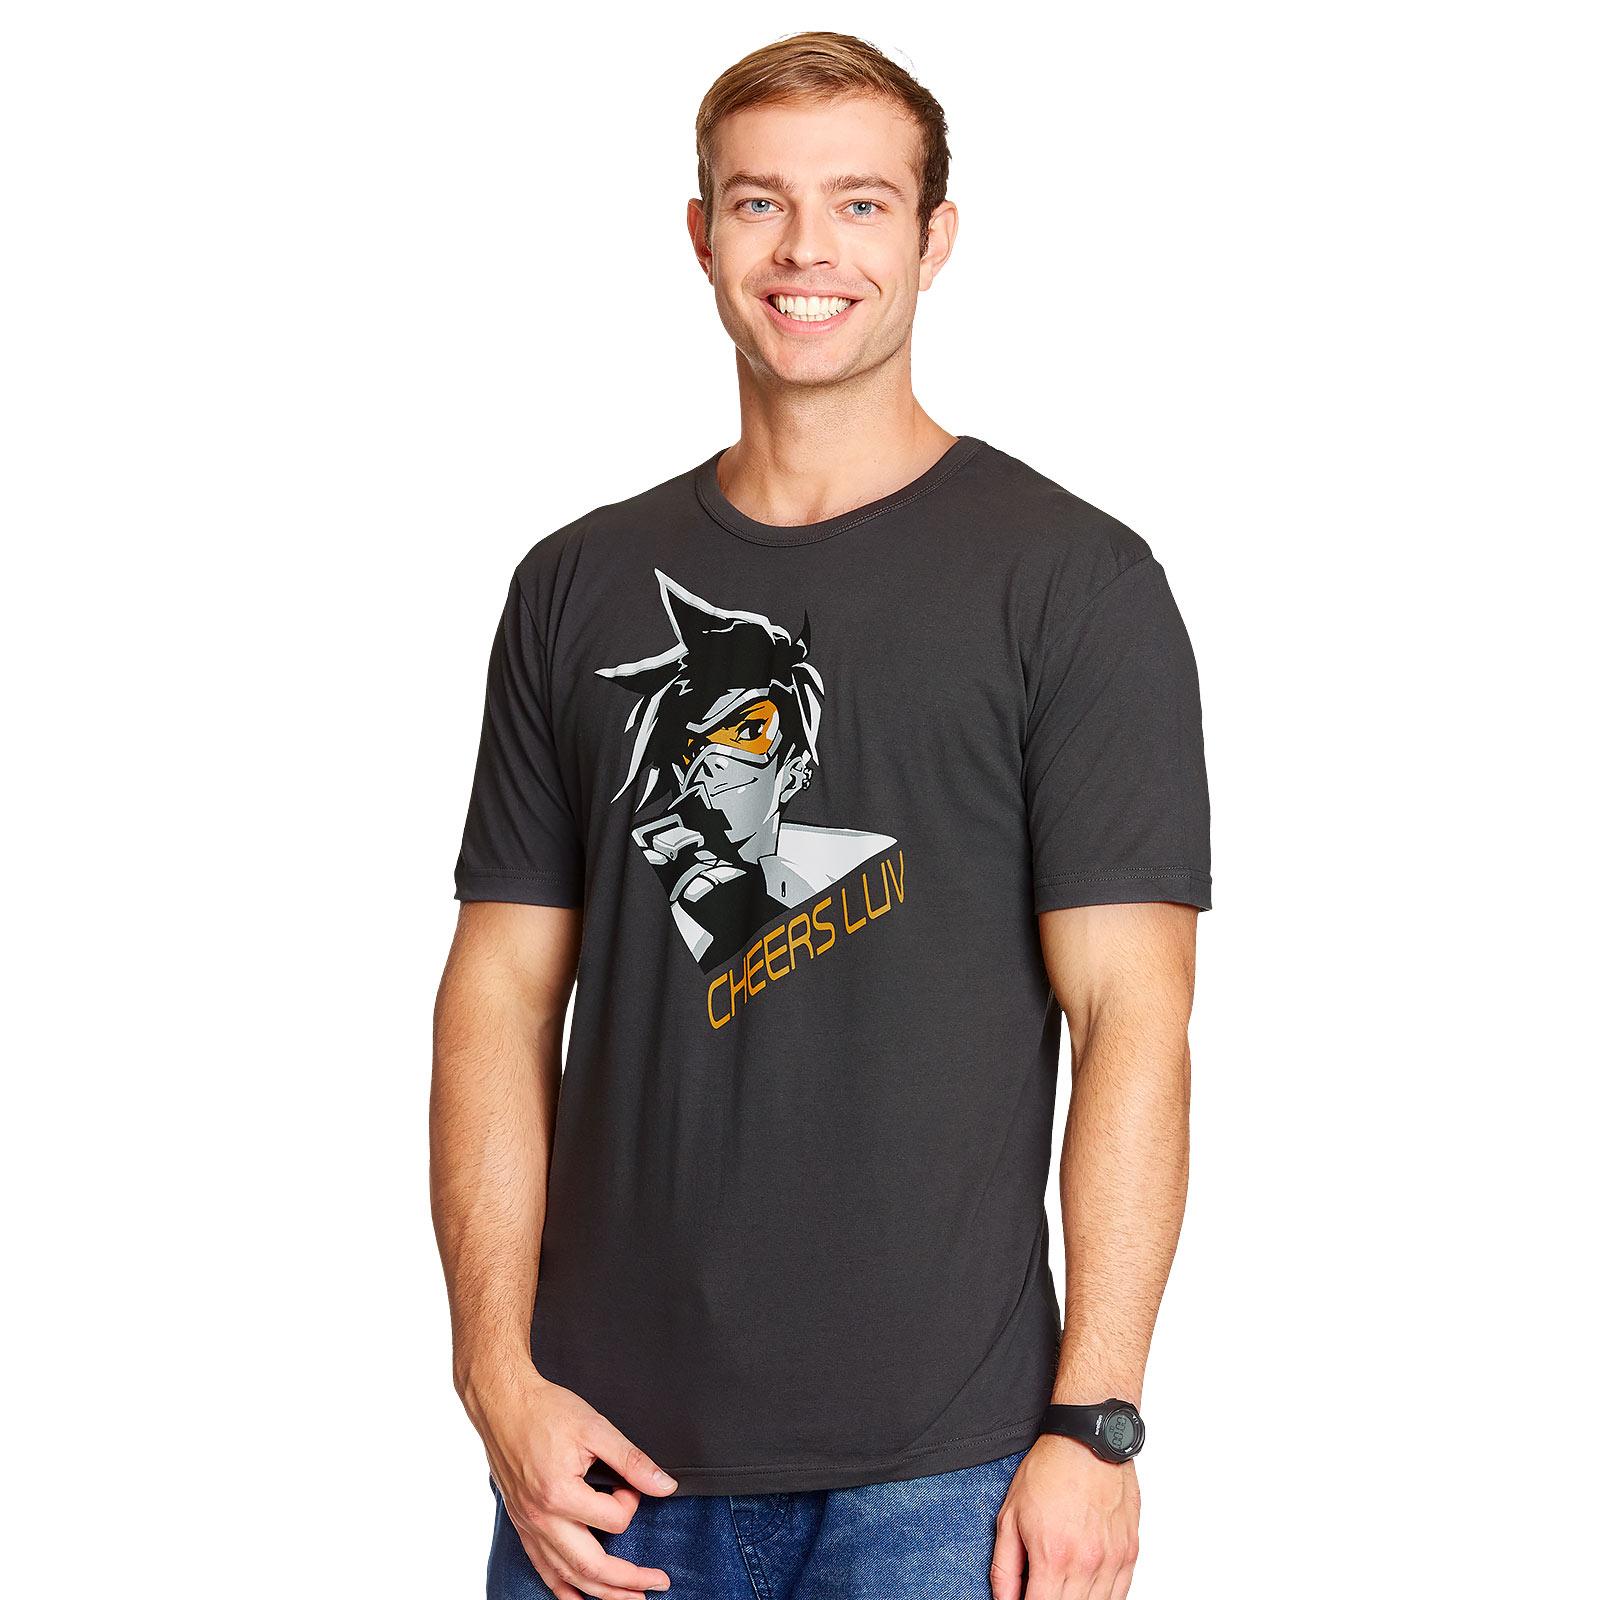 Overwatch - Tracer T-Shirt grau